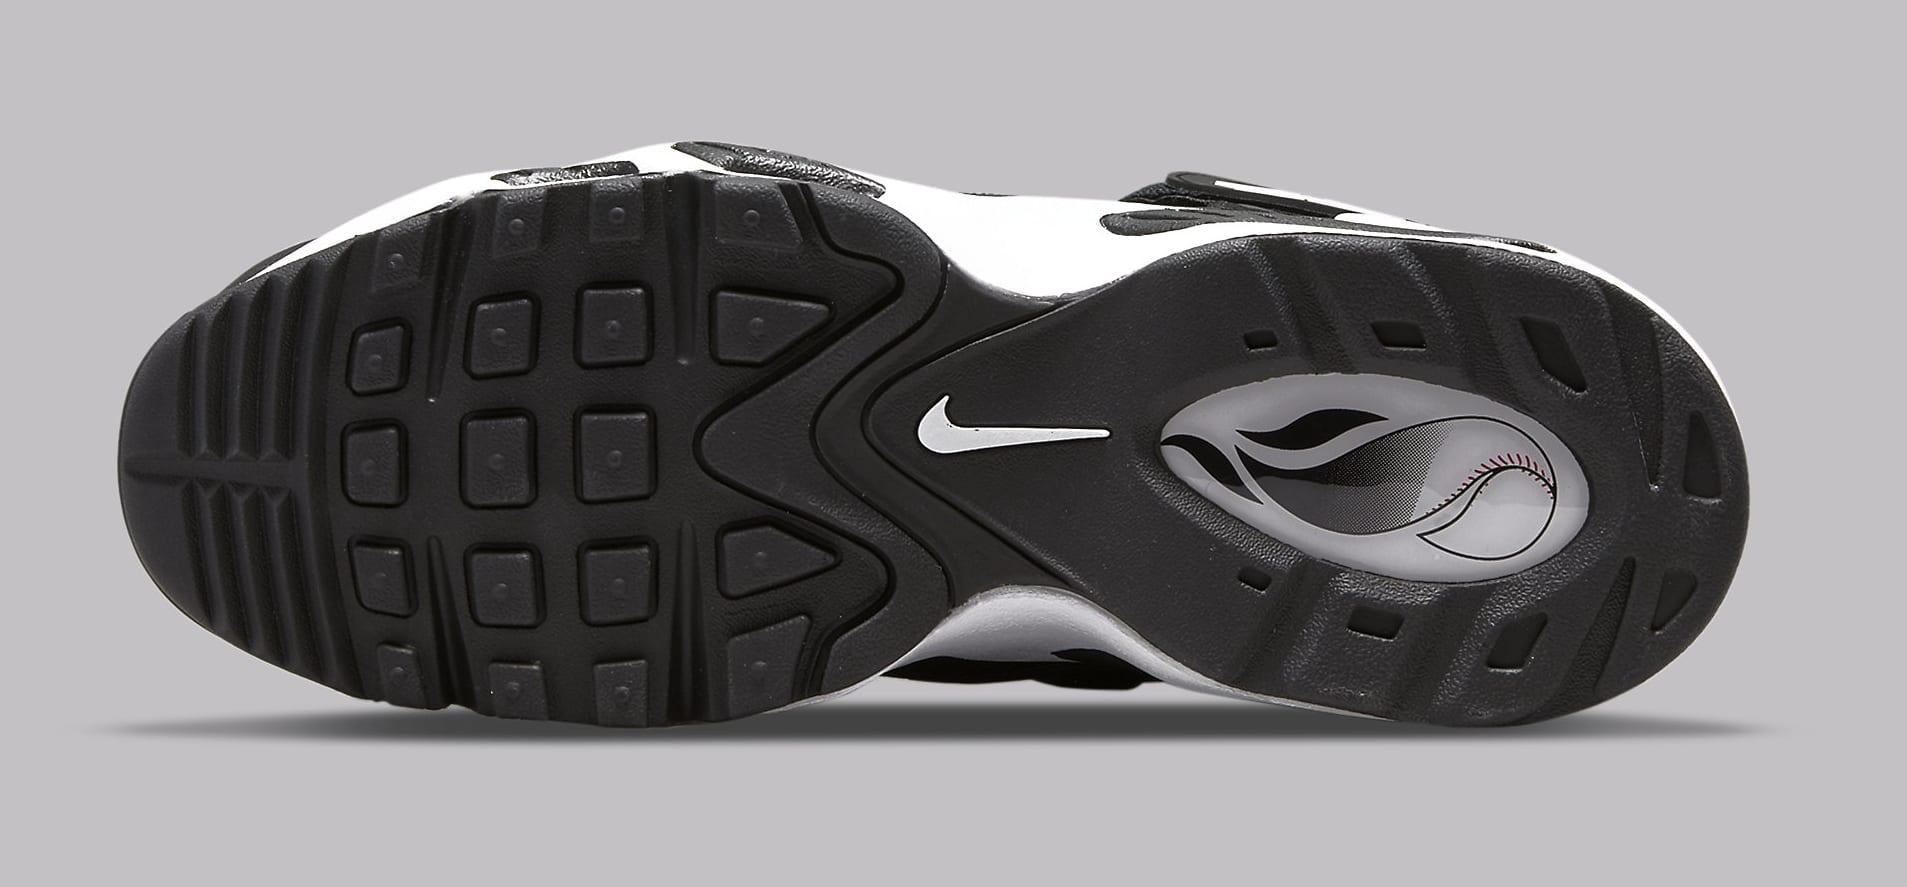 Nike Air Griffey Max 1 '42' DM0044-001 Outsole